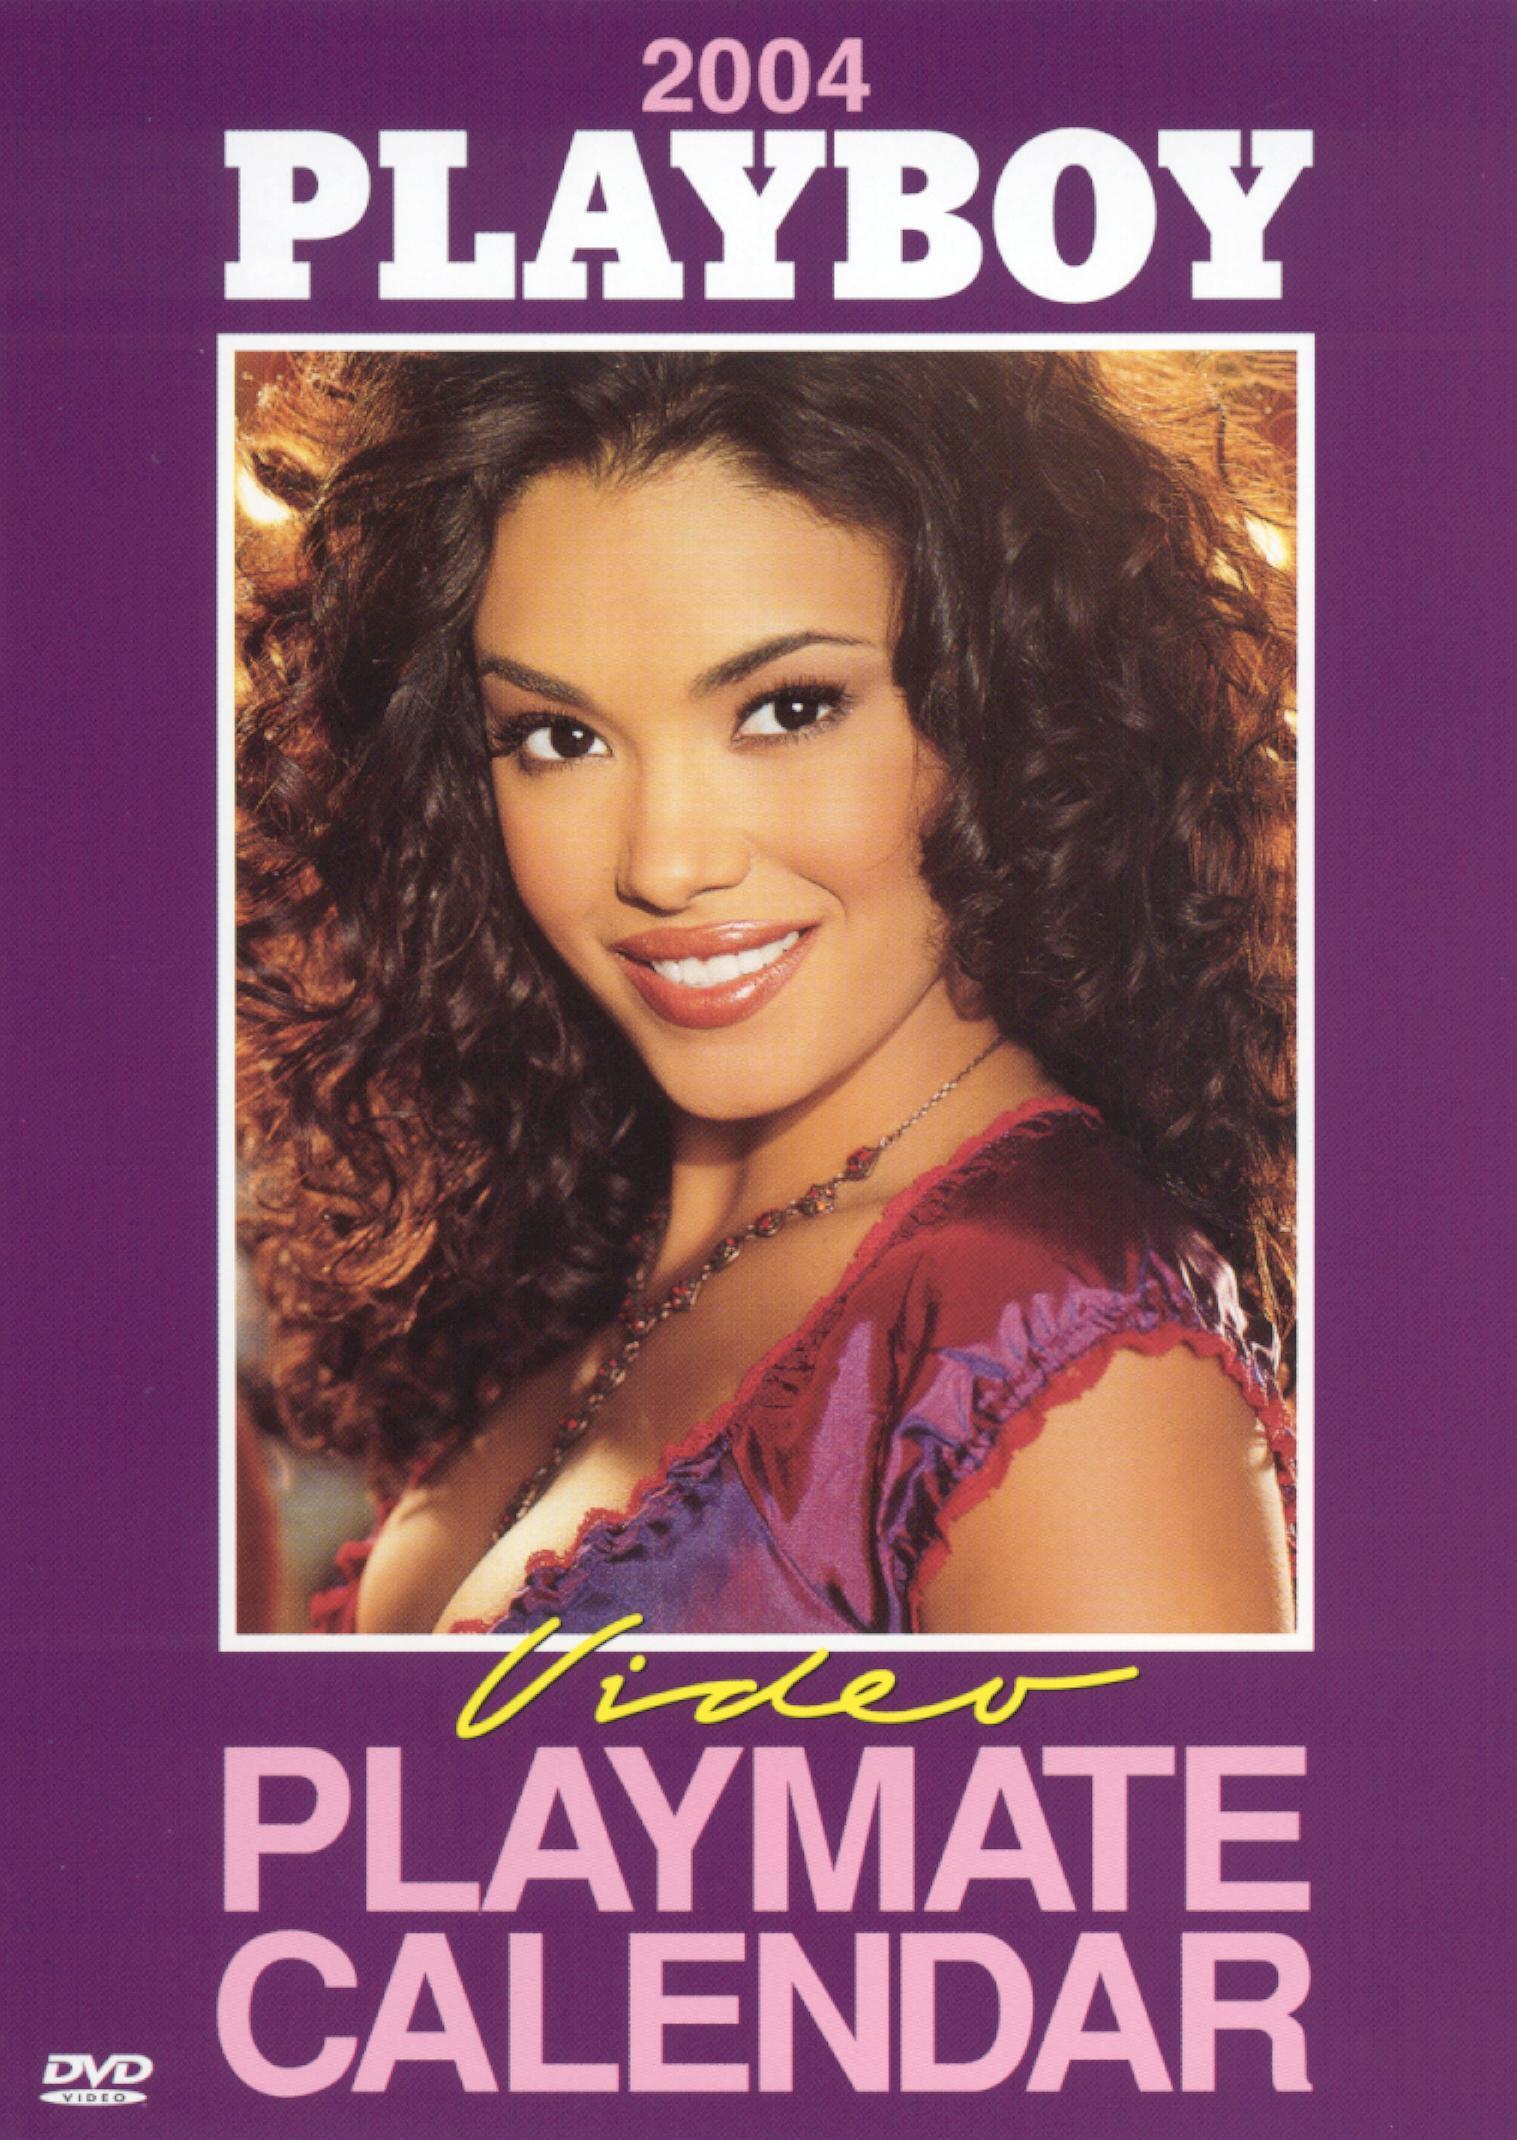 Playboy: 2004 Video Playmate Calendar